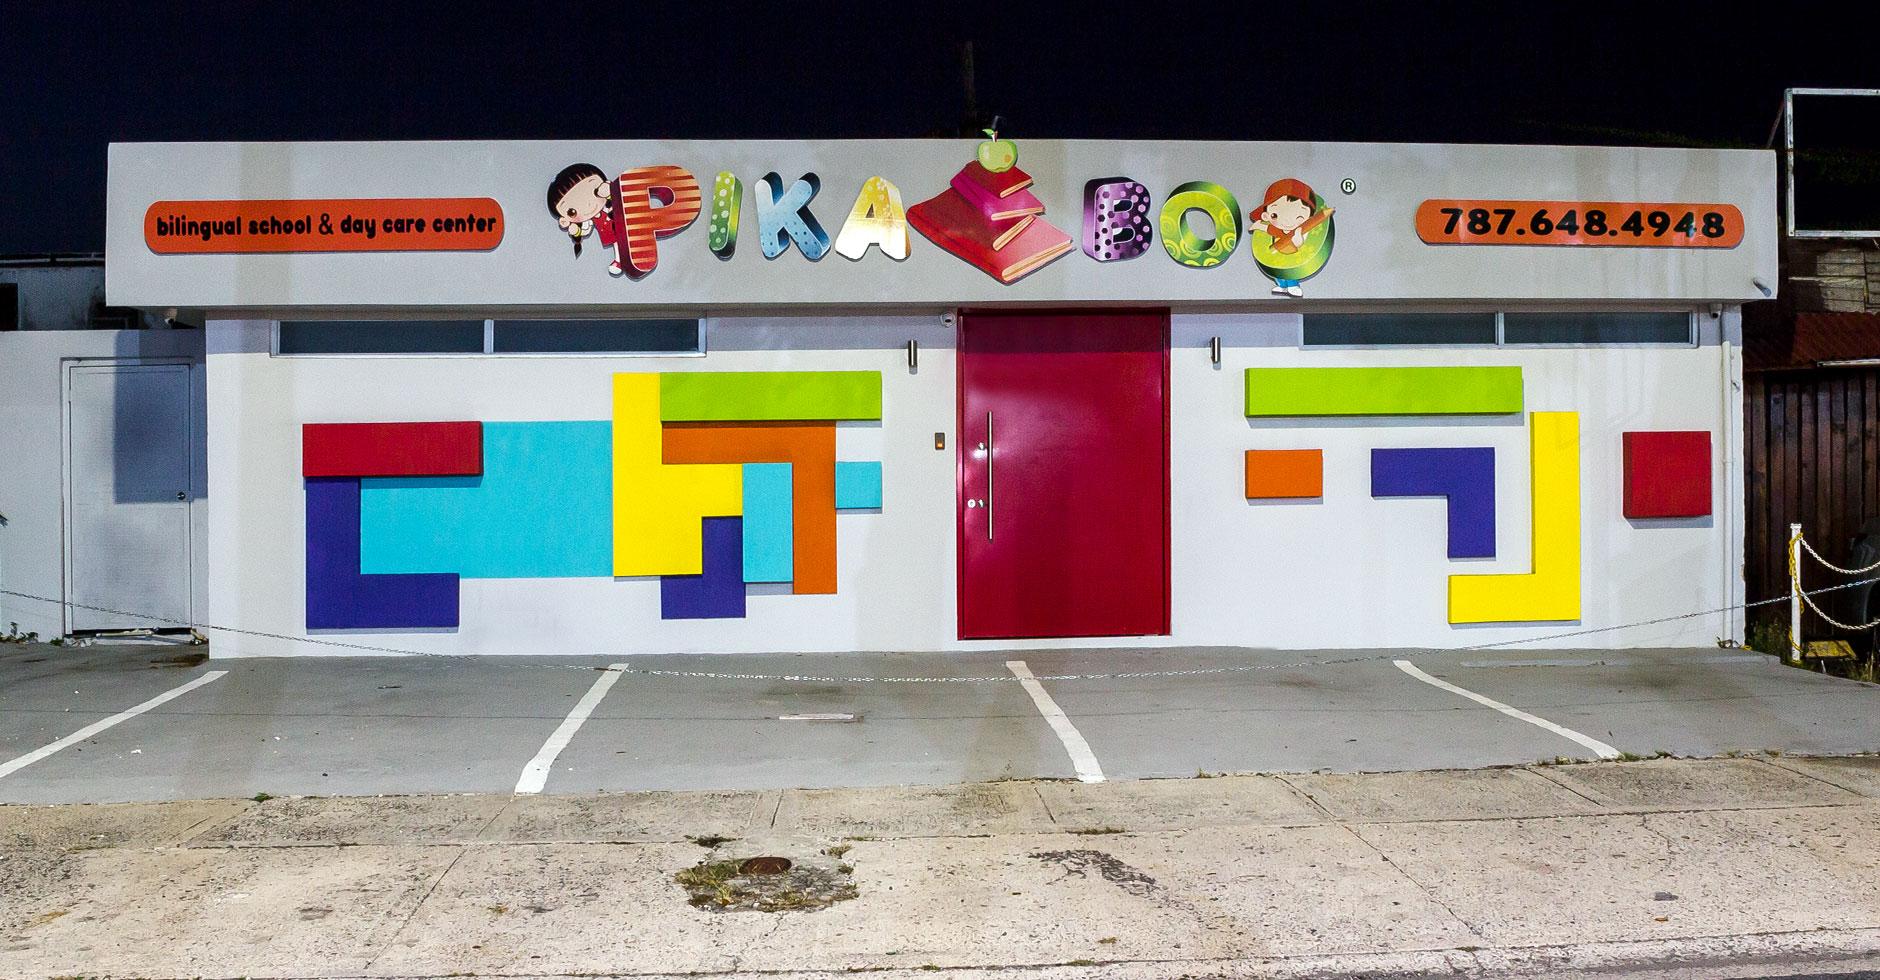 Pikaboo Bilingual School & Day Care